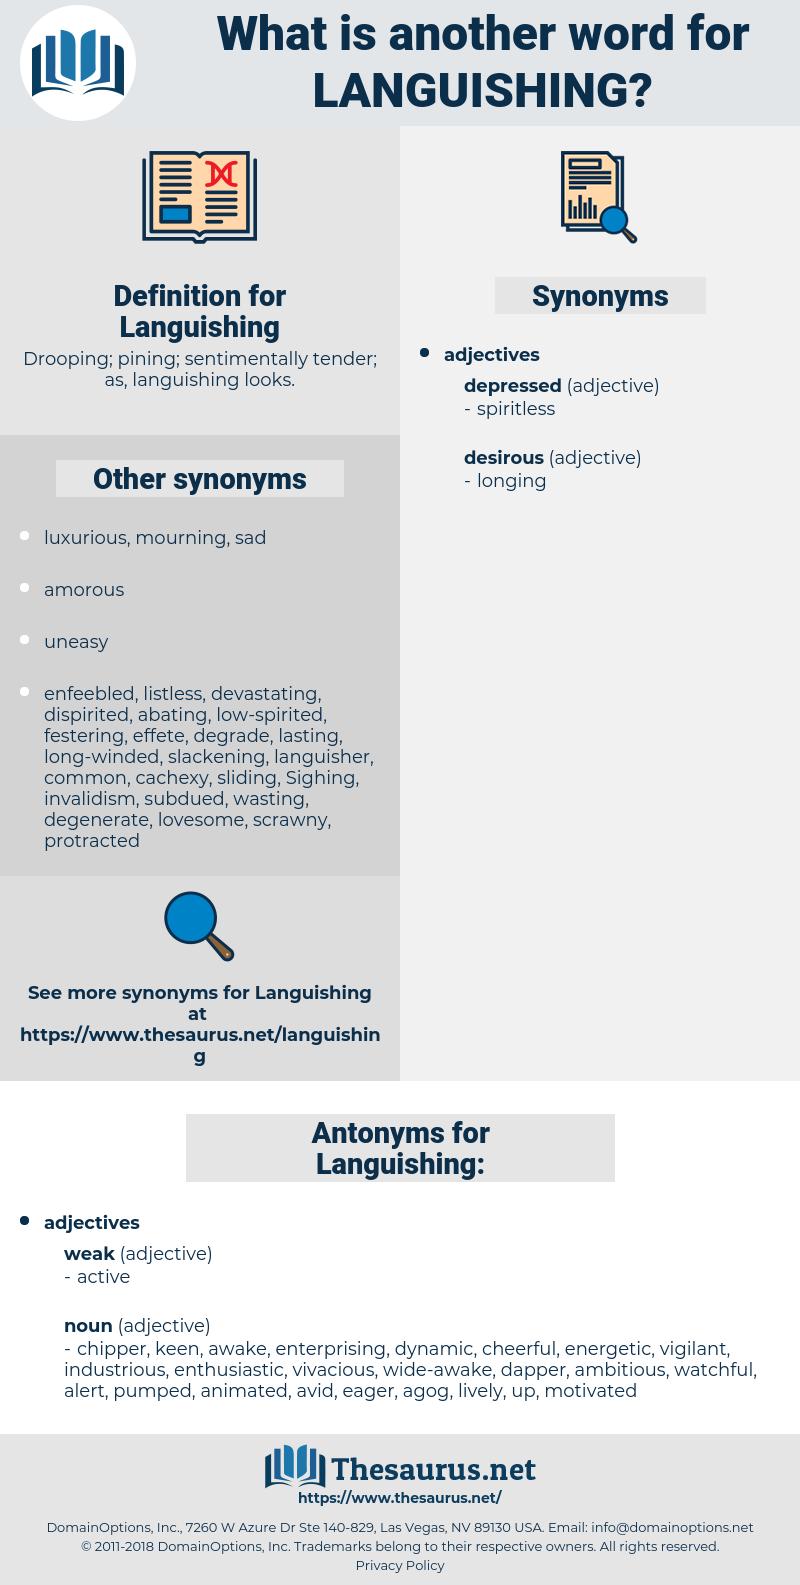 Languishing, synonym Languishing, another word for Languishing, words like Languishing, thesaurus Languishing